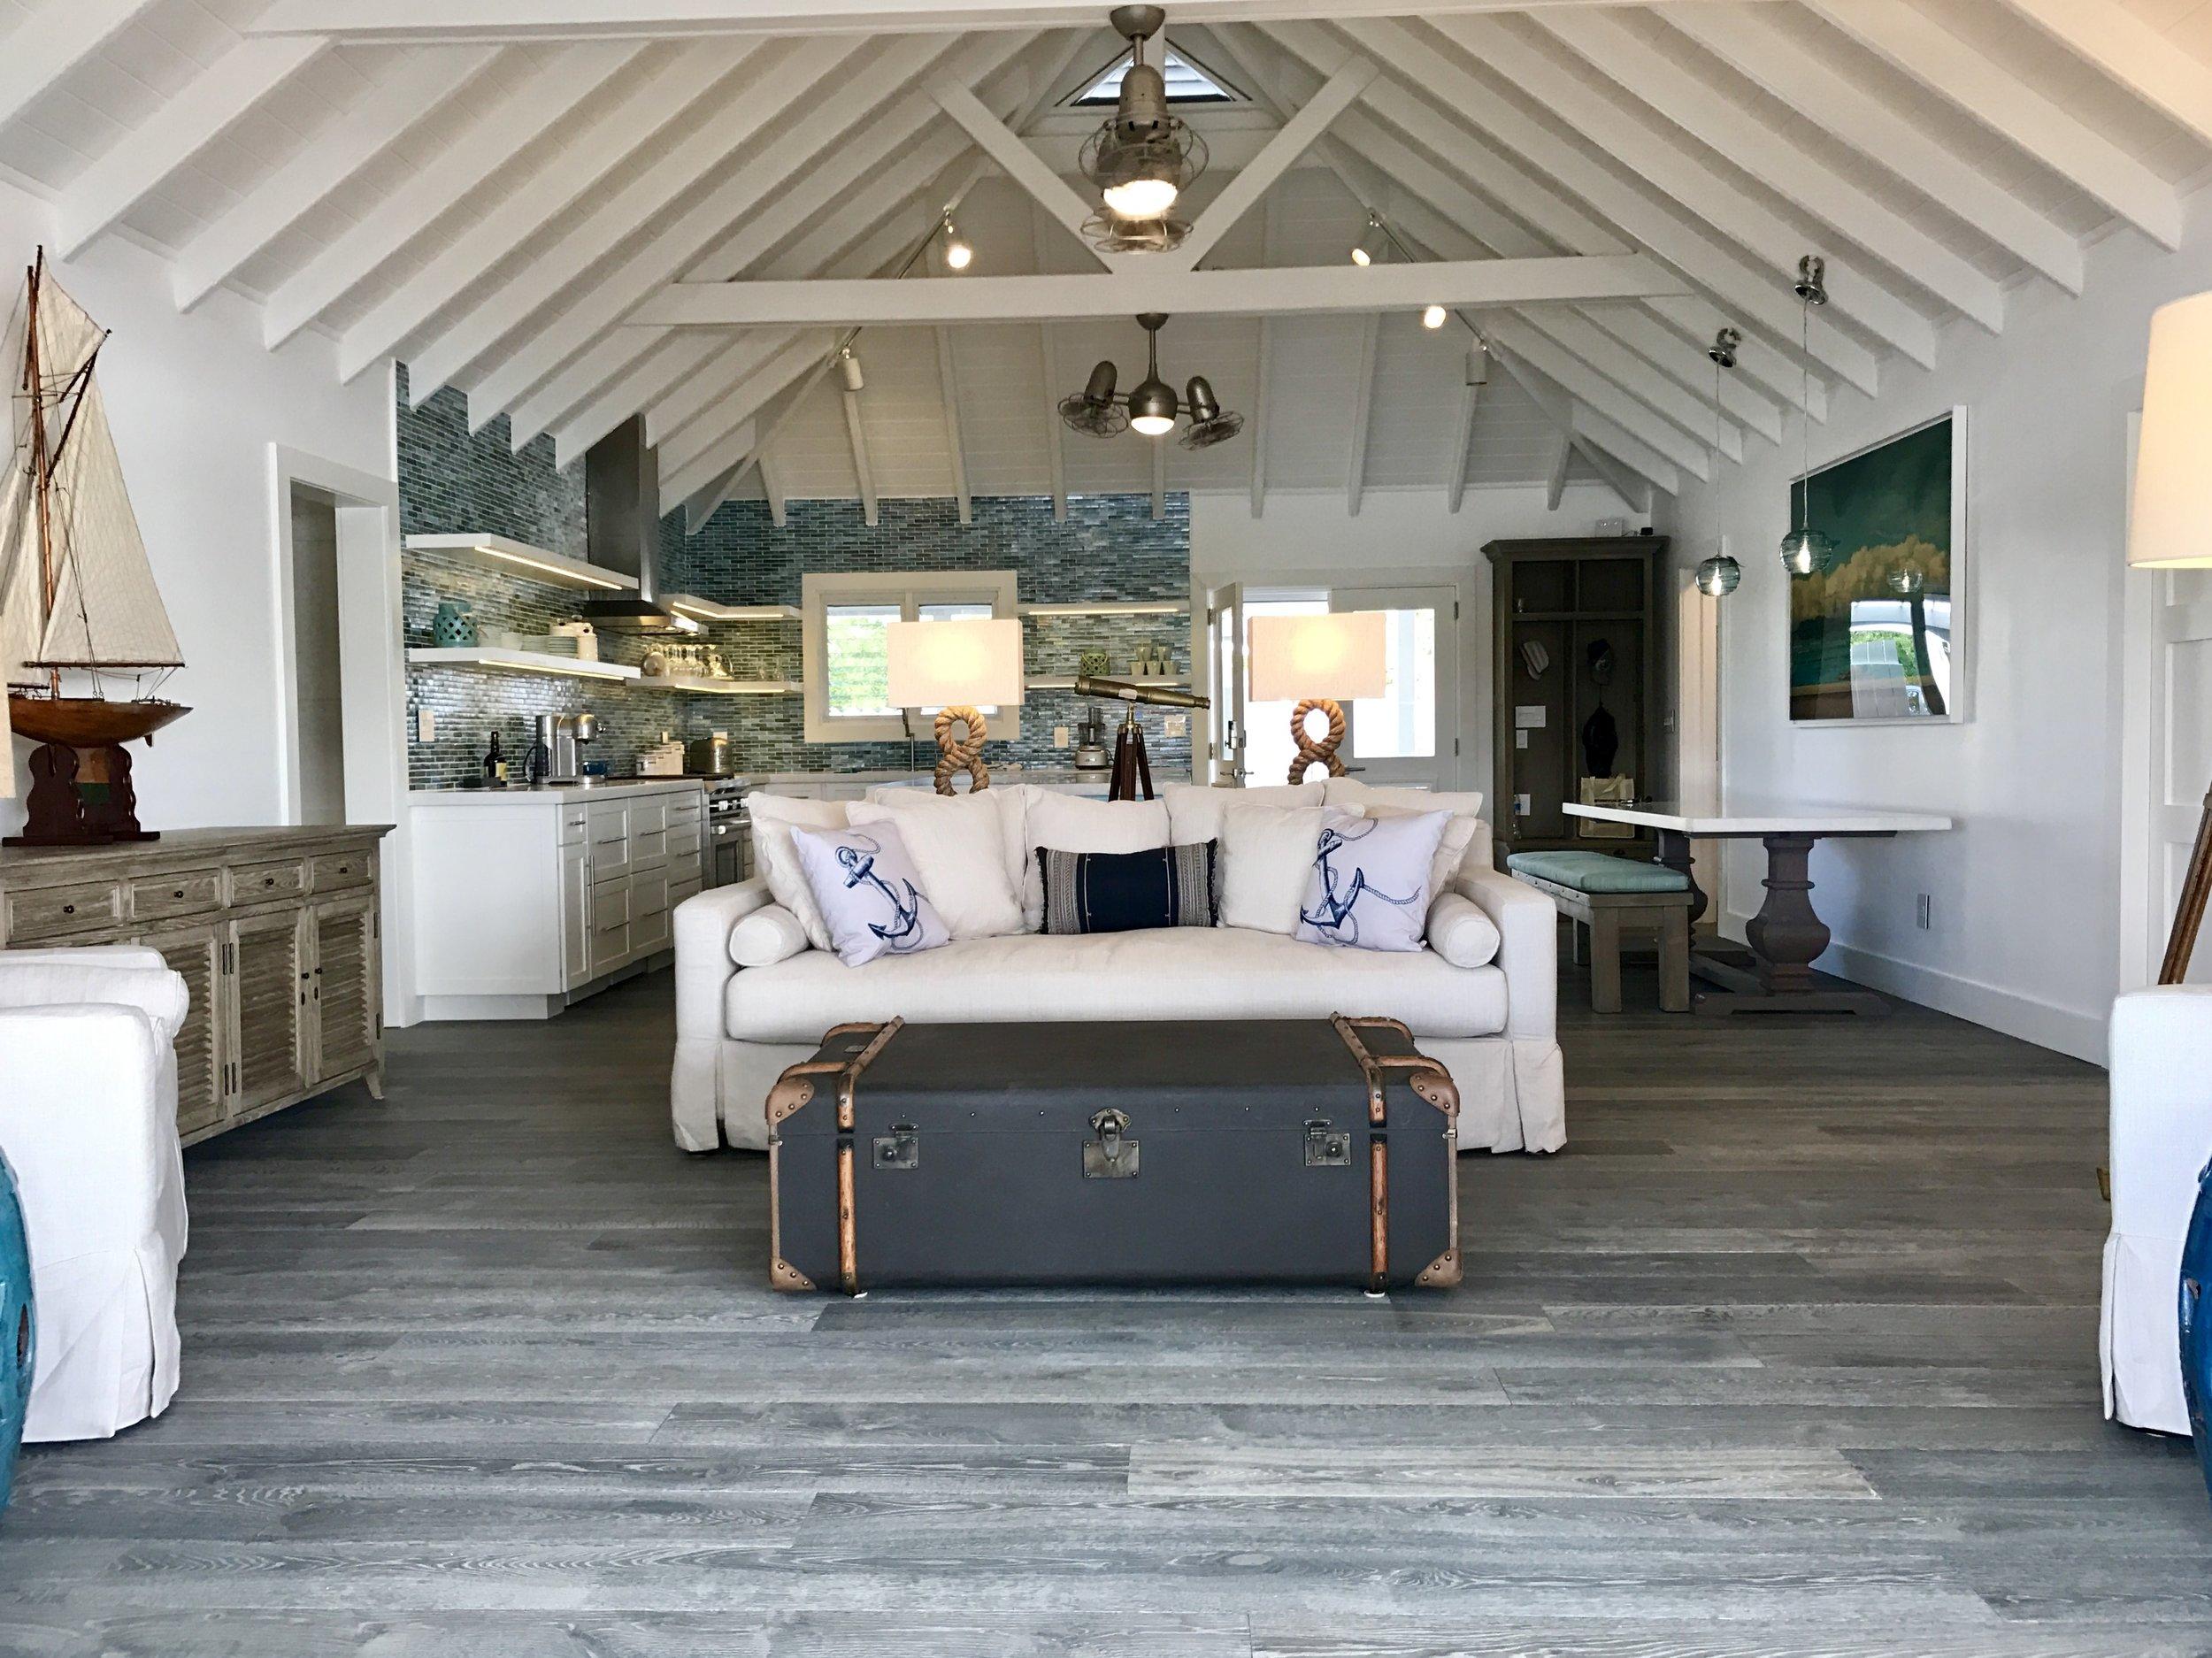 A living room designed by Charmaine B Werth. Photo courtesy of Charmaine B. Werth.